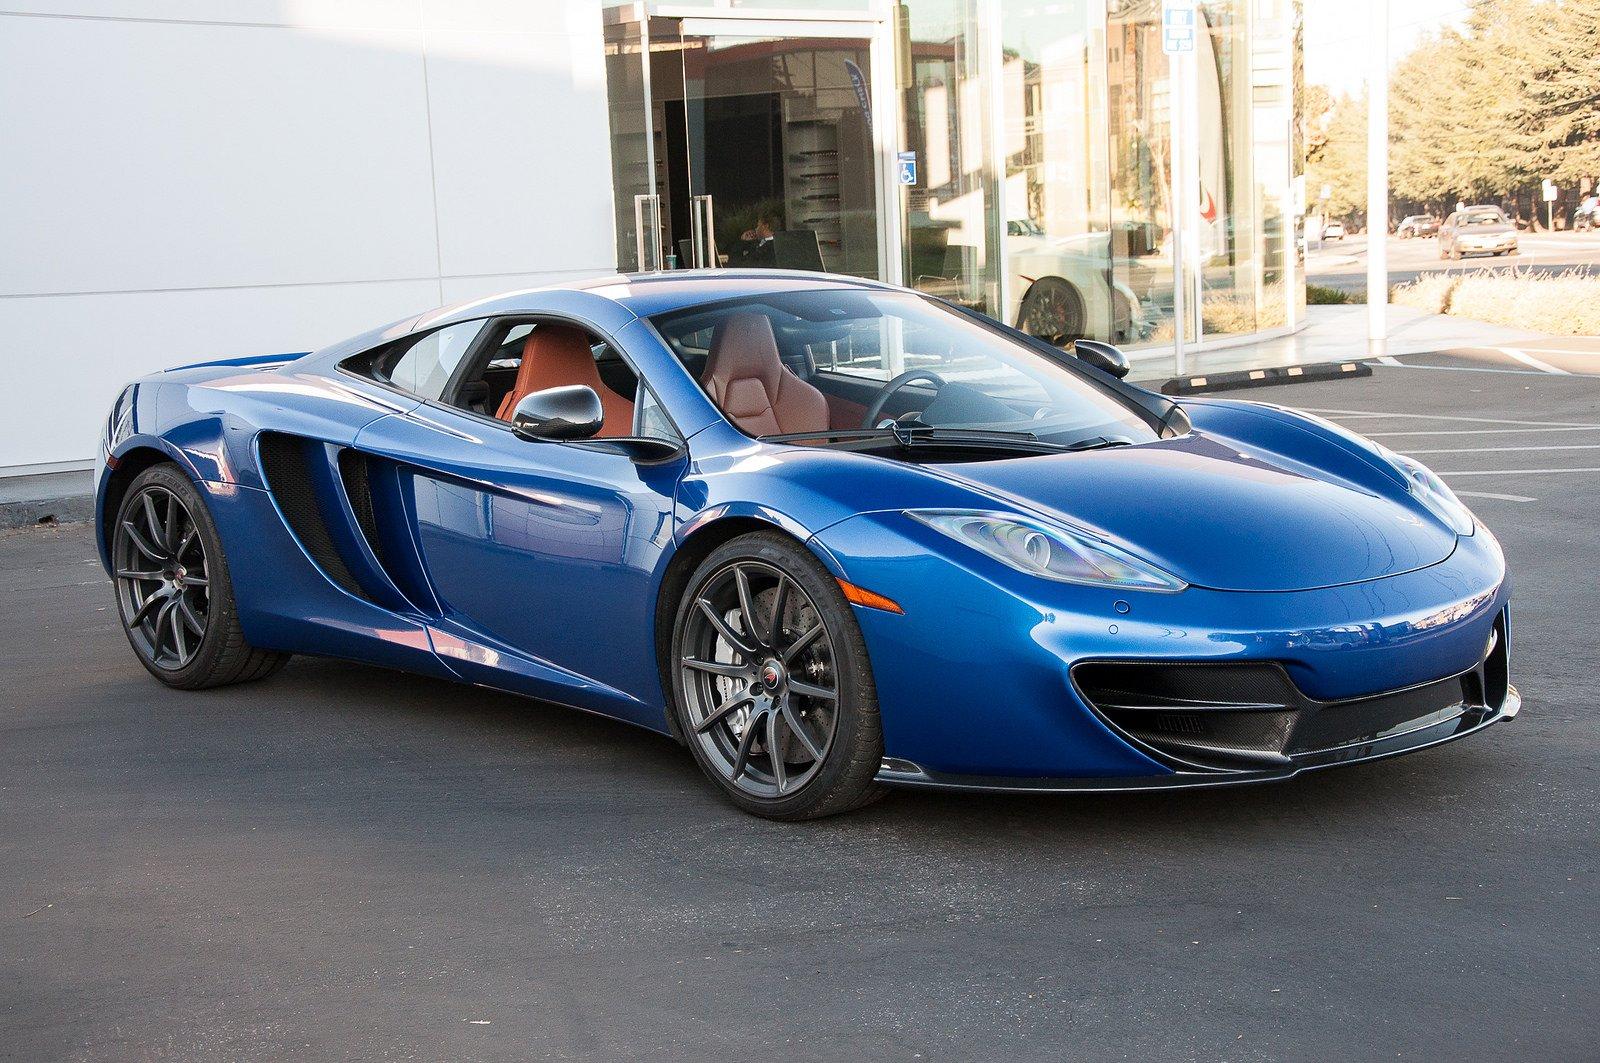 Car Wallpaper >> 12c McLaren mp4 Supercar color Azure Blue 1398 wallpaper | 1600x1063 | 397492 | WallpaperUP